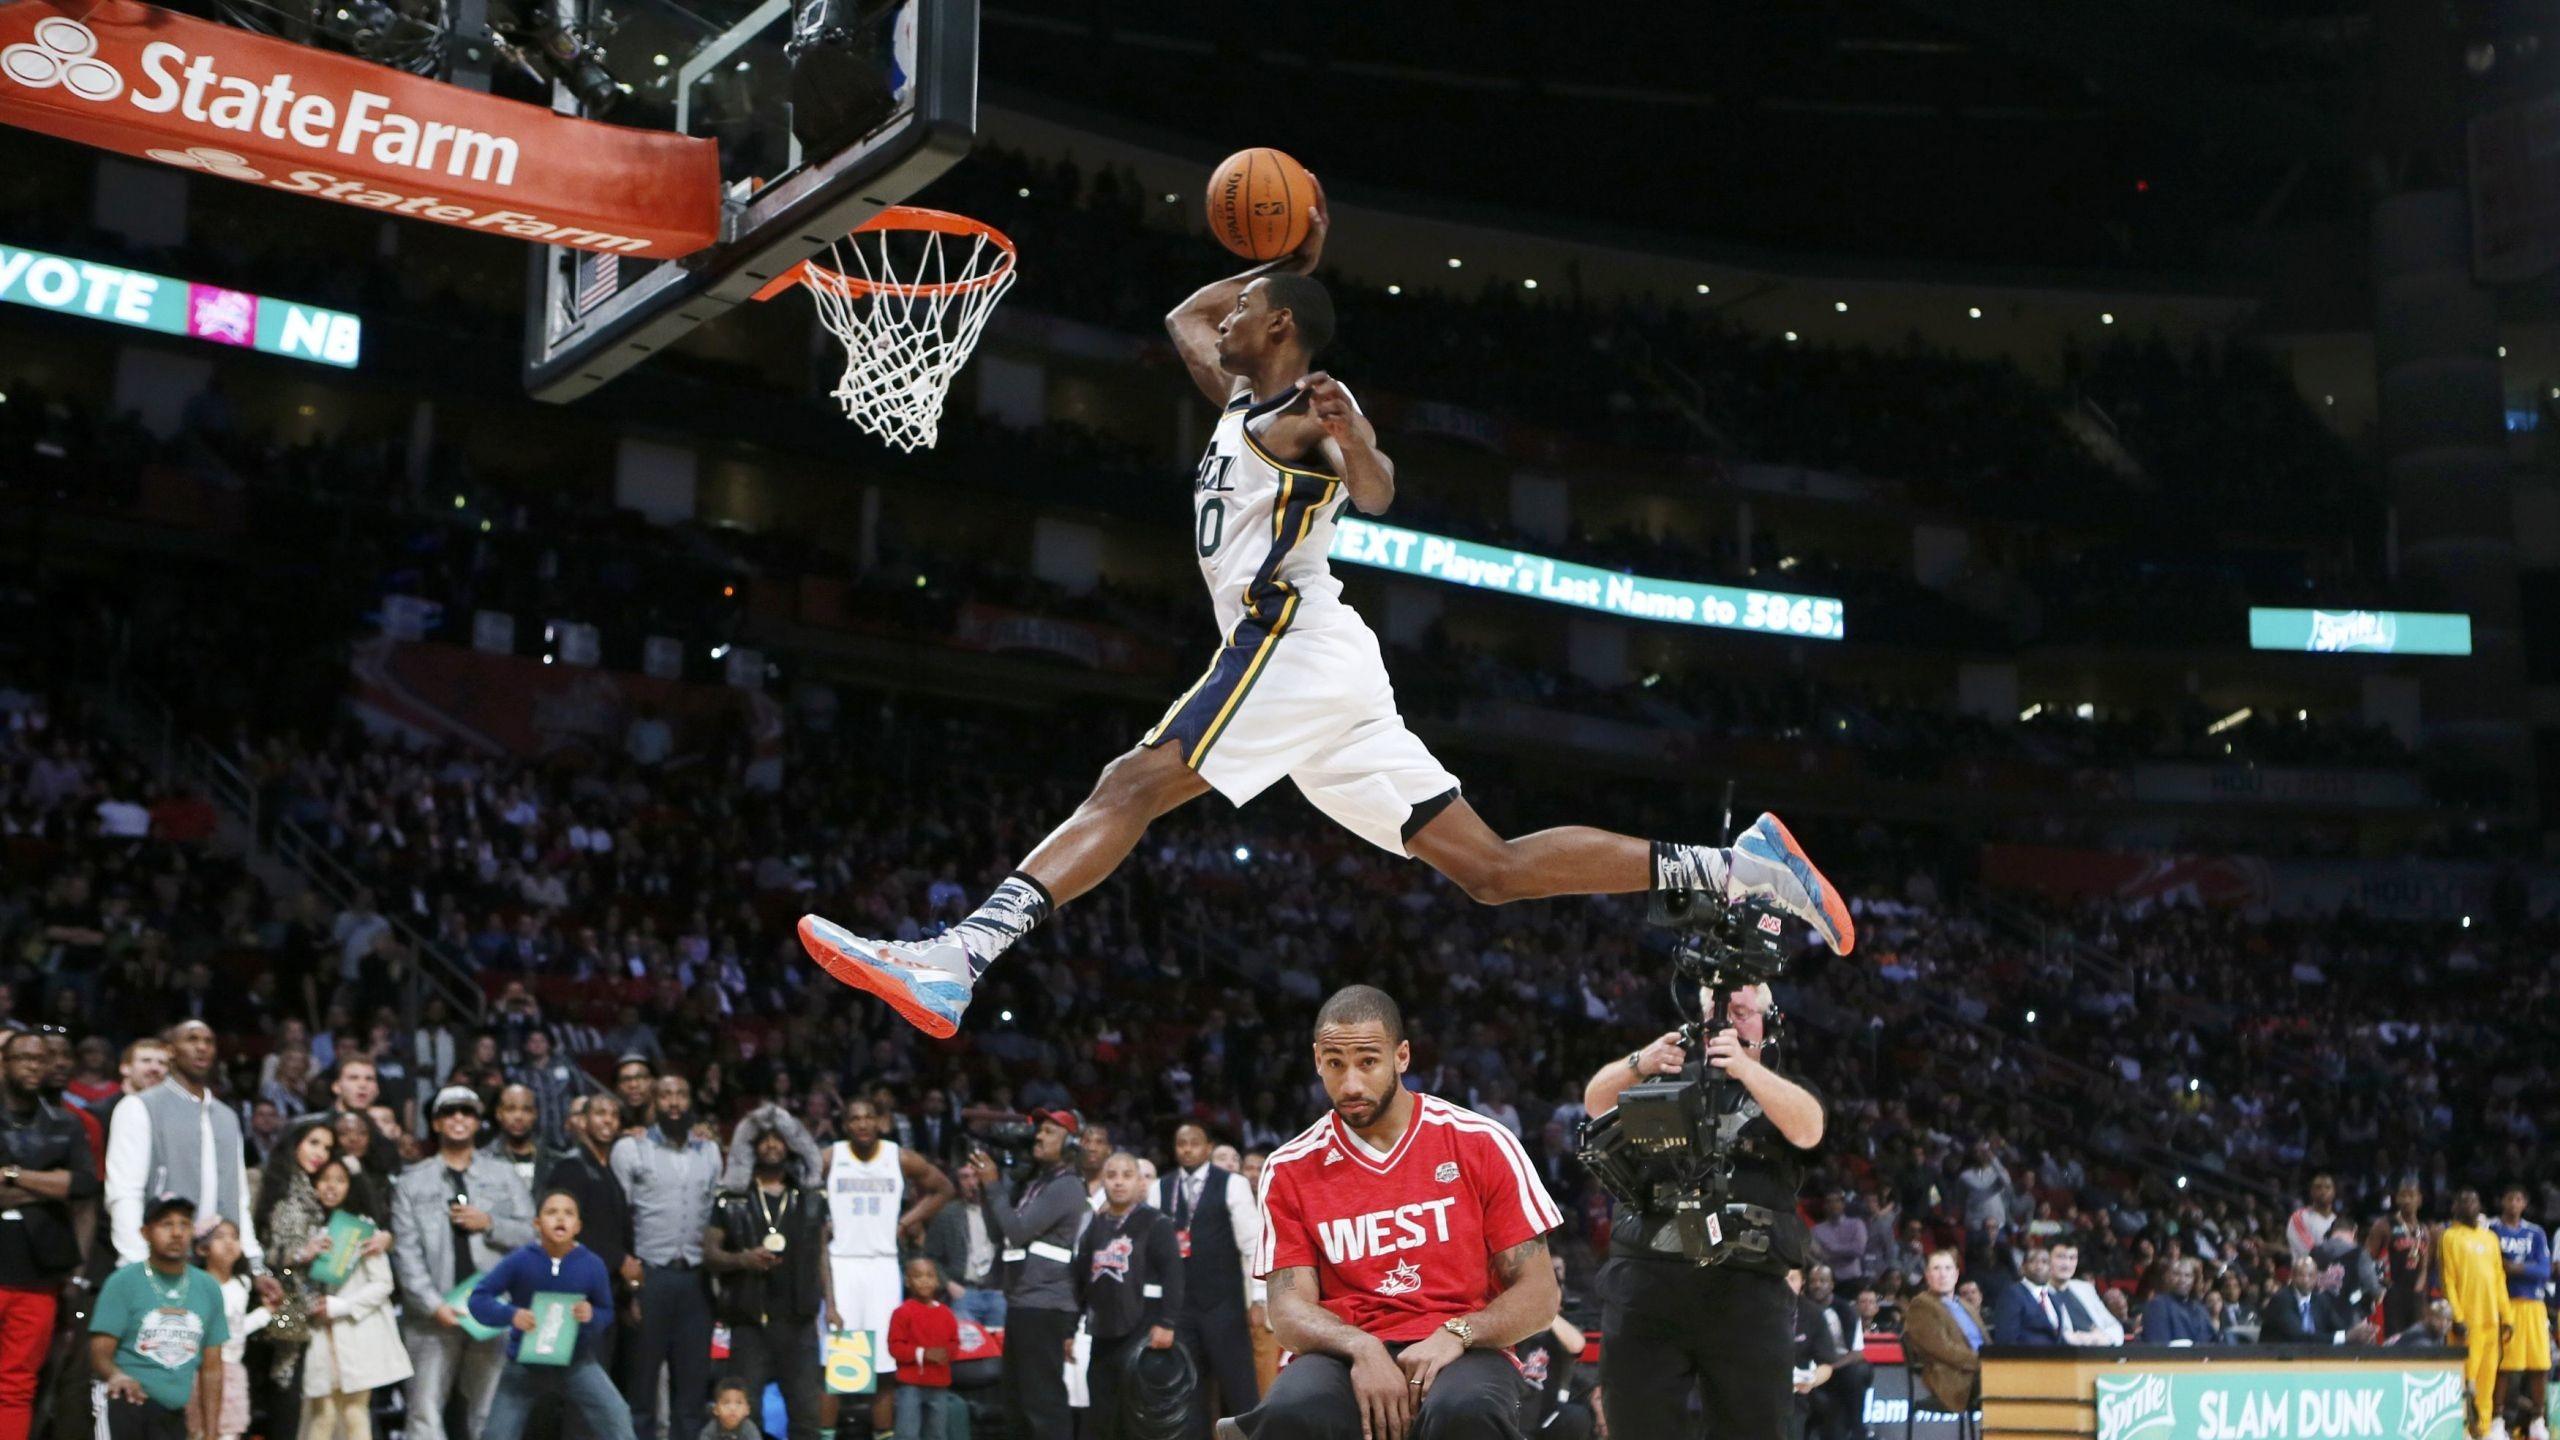 Jordan Wallpaper Vs Kobe